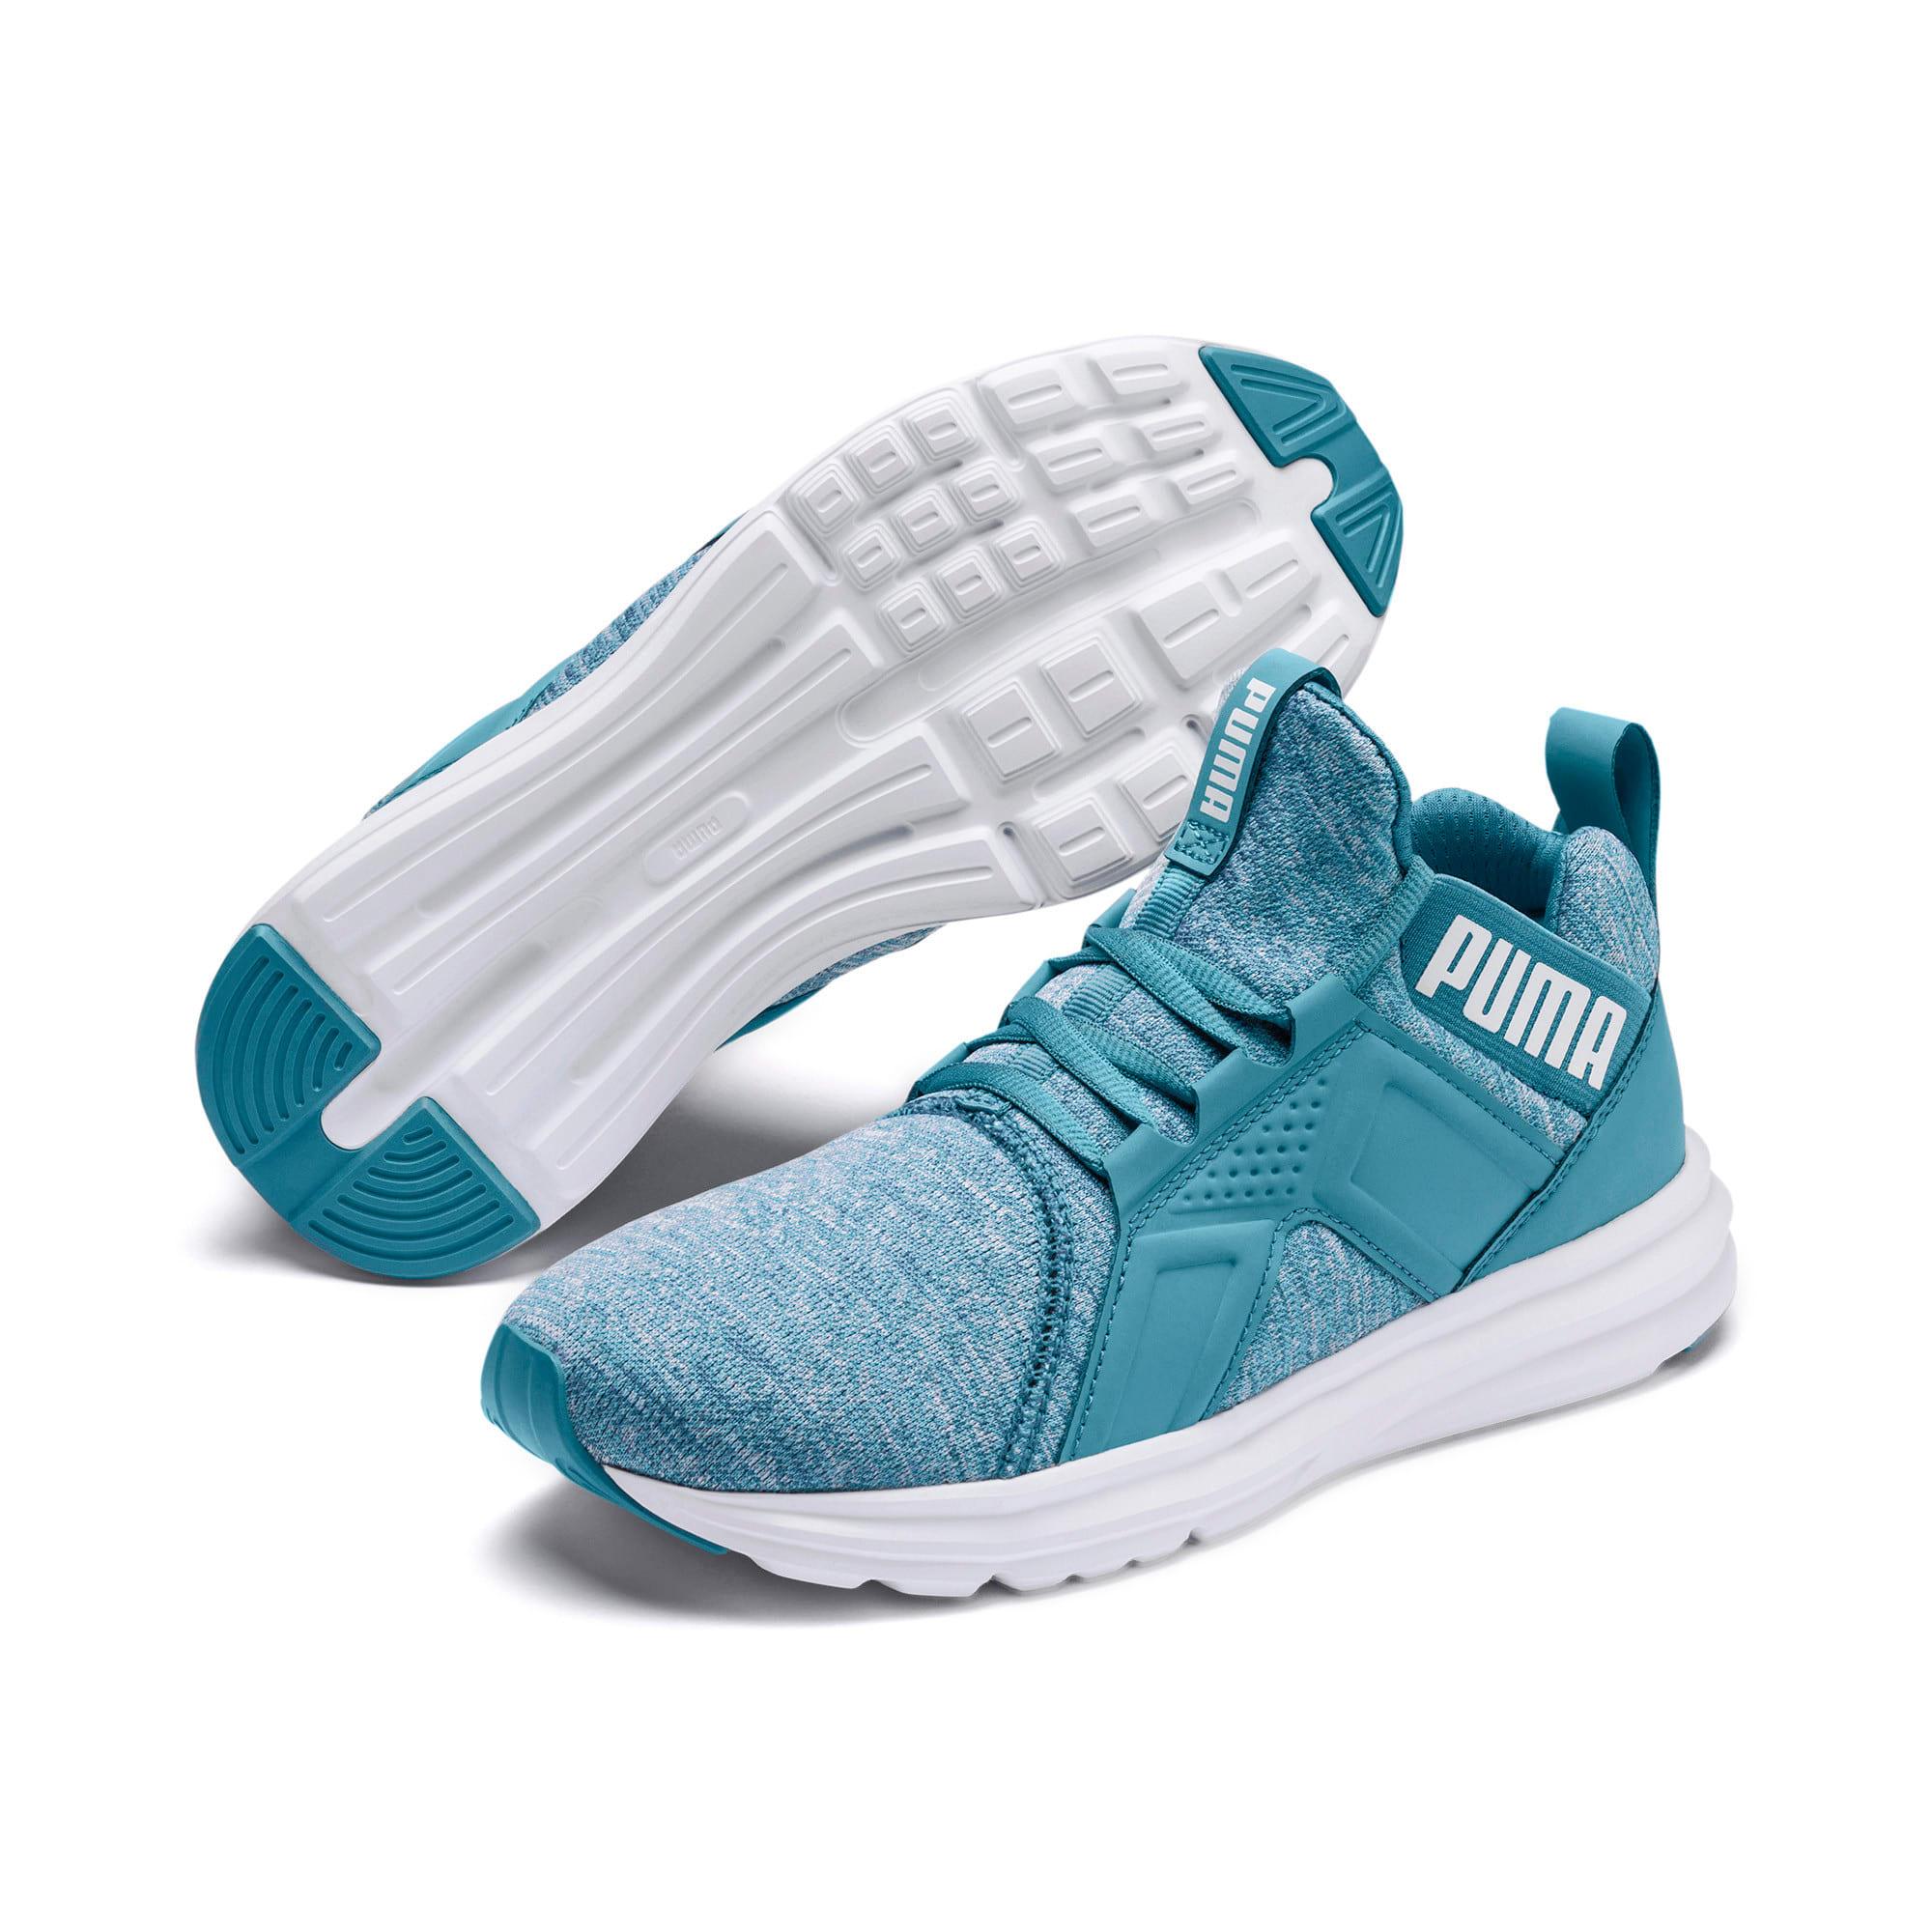 Thumbnail 2 of Enzo Heather Women's Sneakers, Bluestone-Milky Blue-White, medium